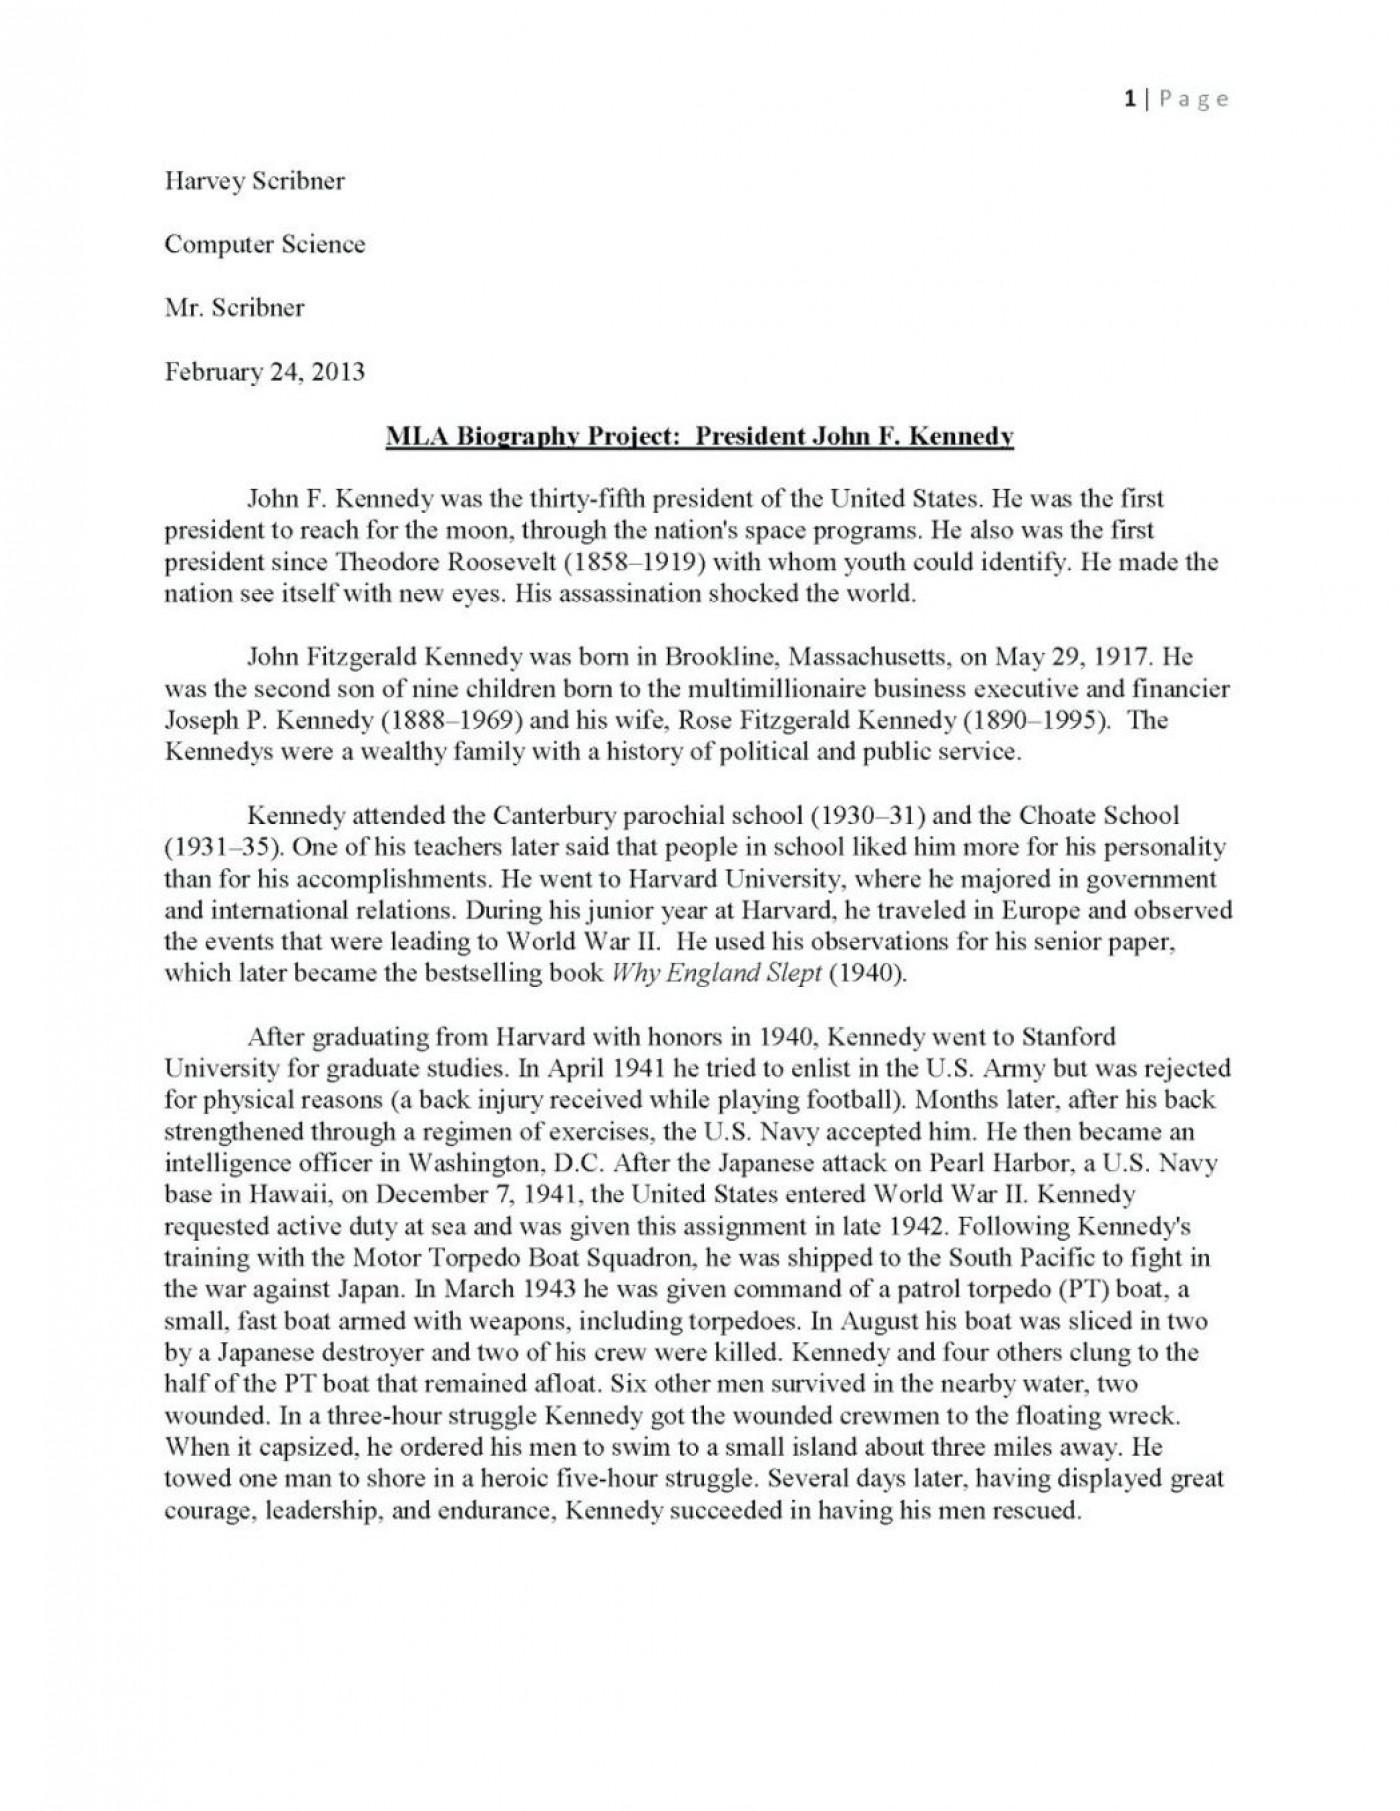 common application essay 2013